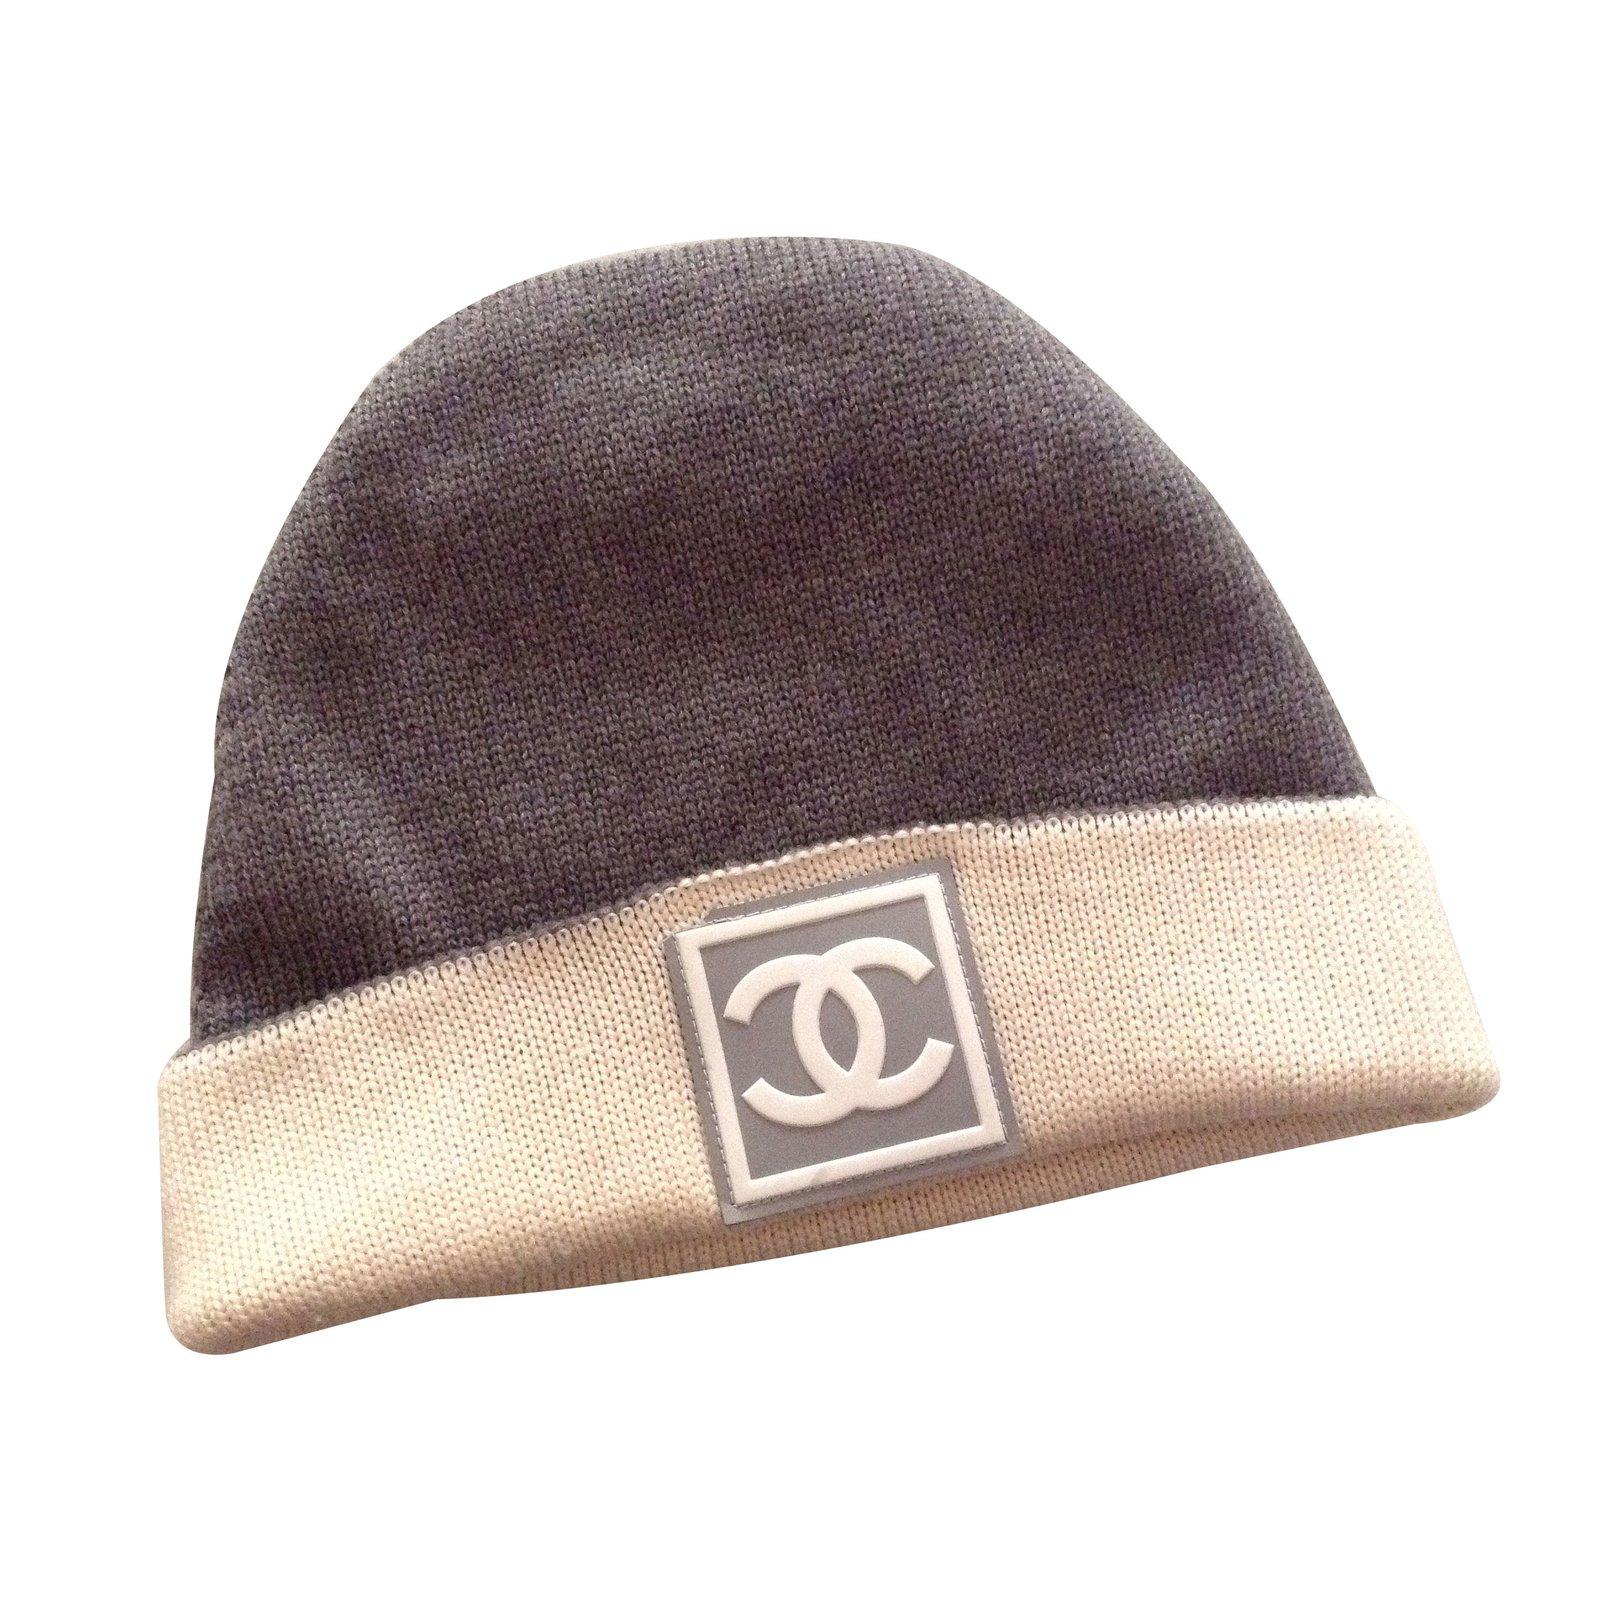 2c520cbf1e0 Chanel Hats Hats Wool Grey ref.13288 - Joli Closet